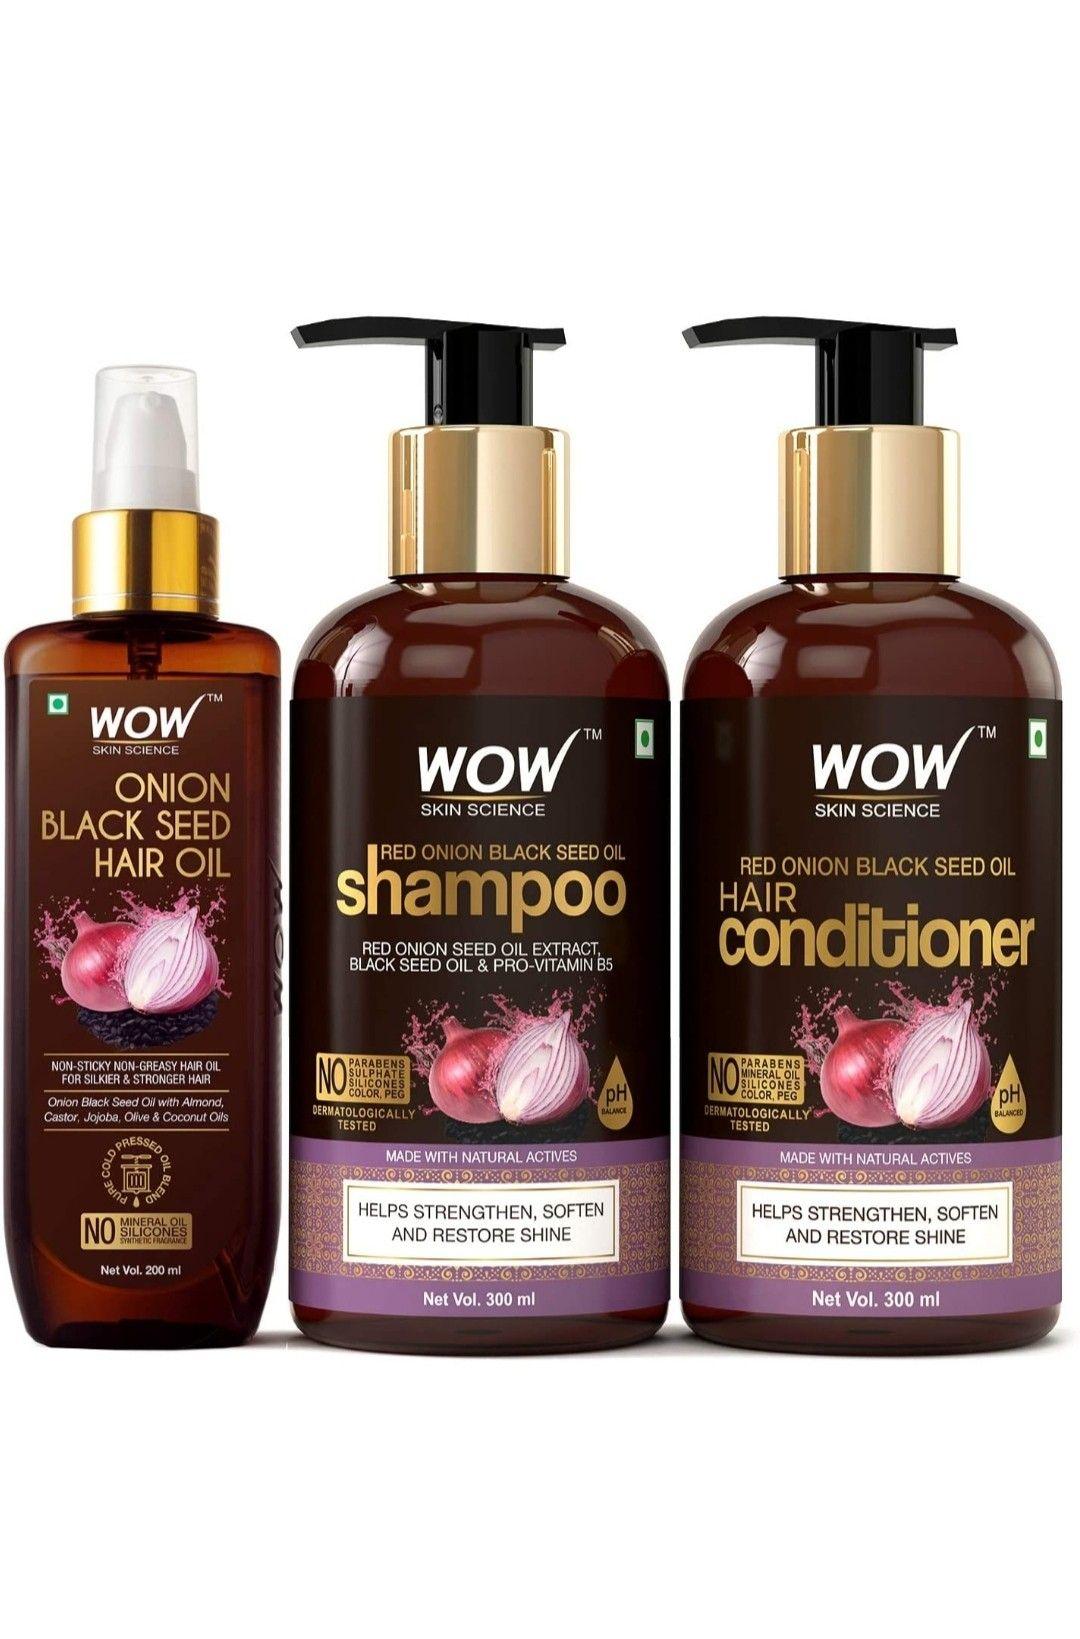 Skin Science Onion Black Seed Oil Ultimate Hair Care Kit